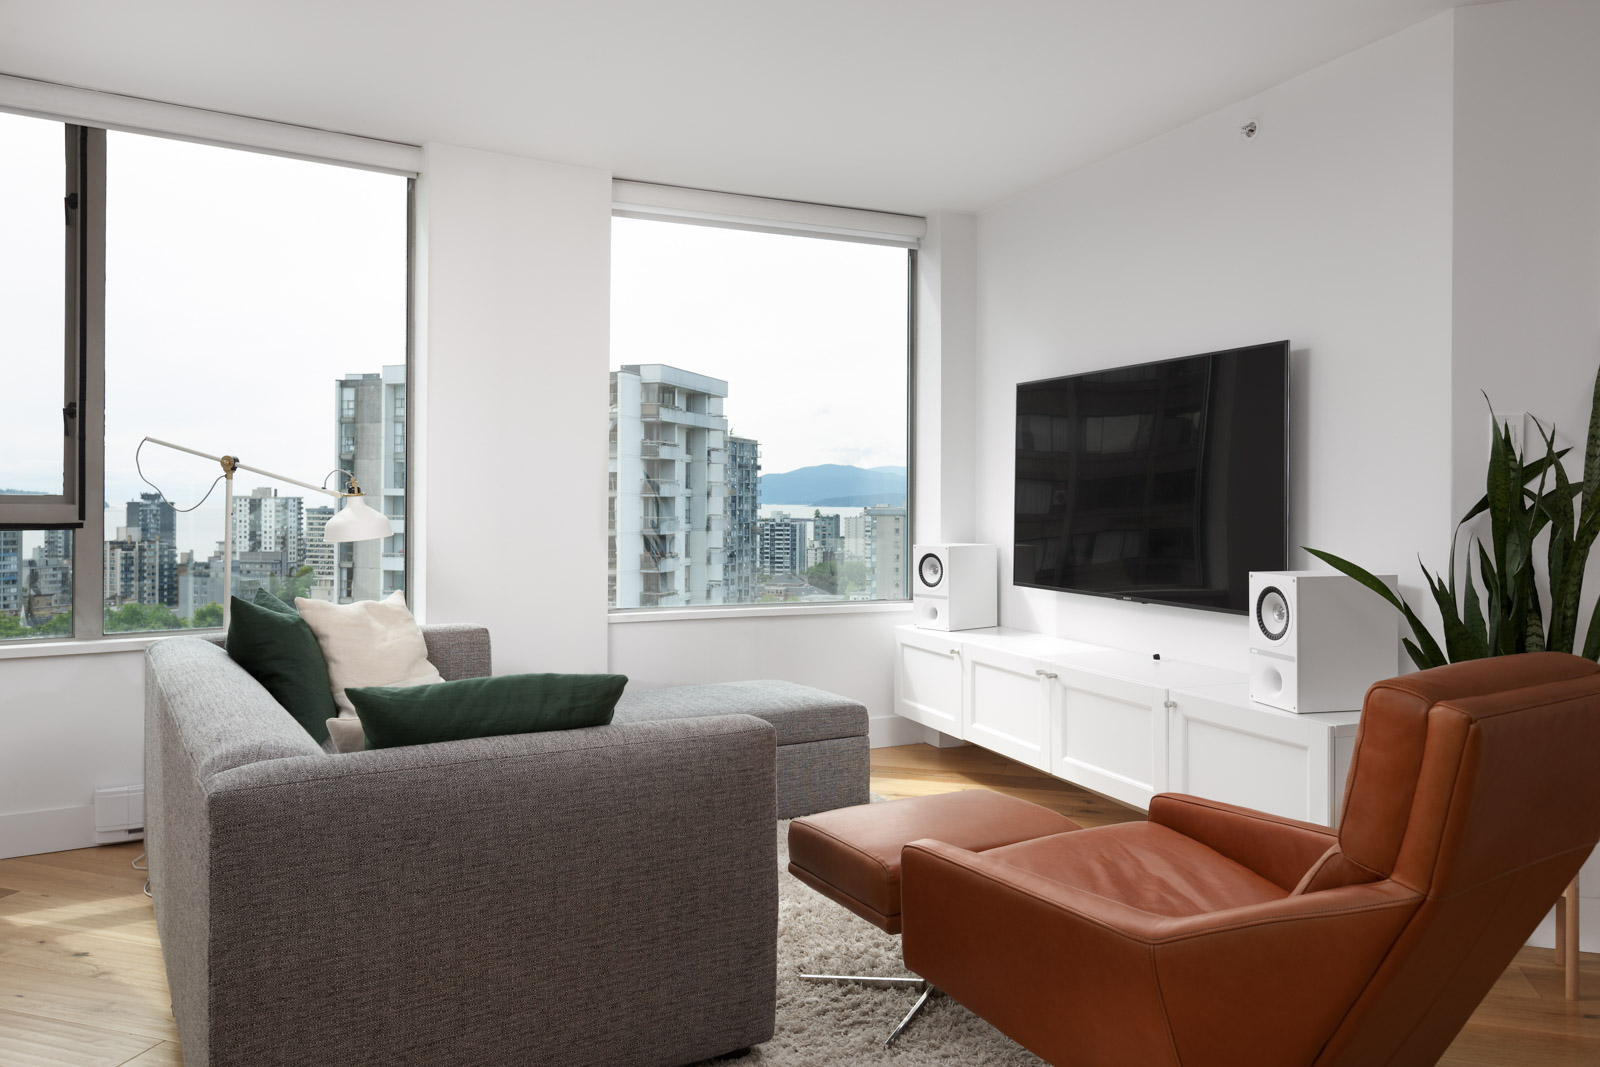 living room with hardwood floors in rental condo in the West End neighbourhood of Vancouver